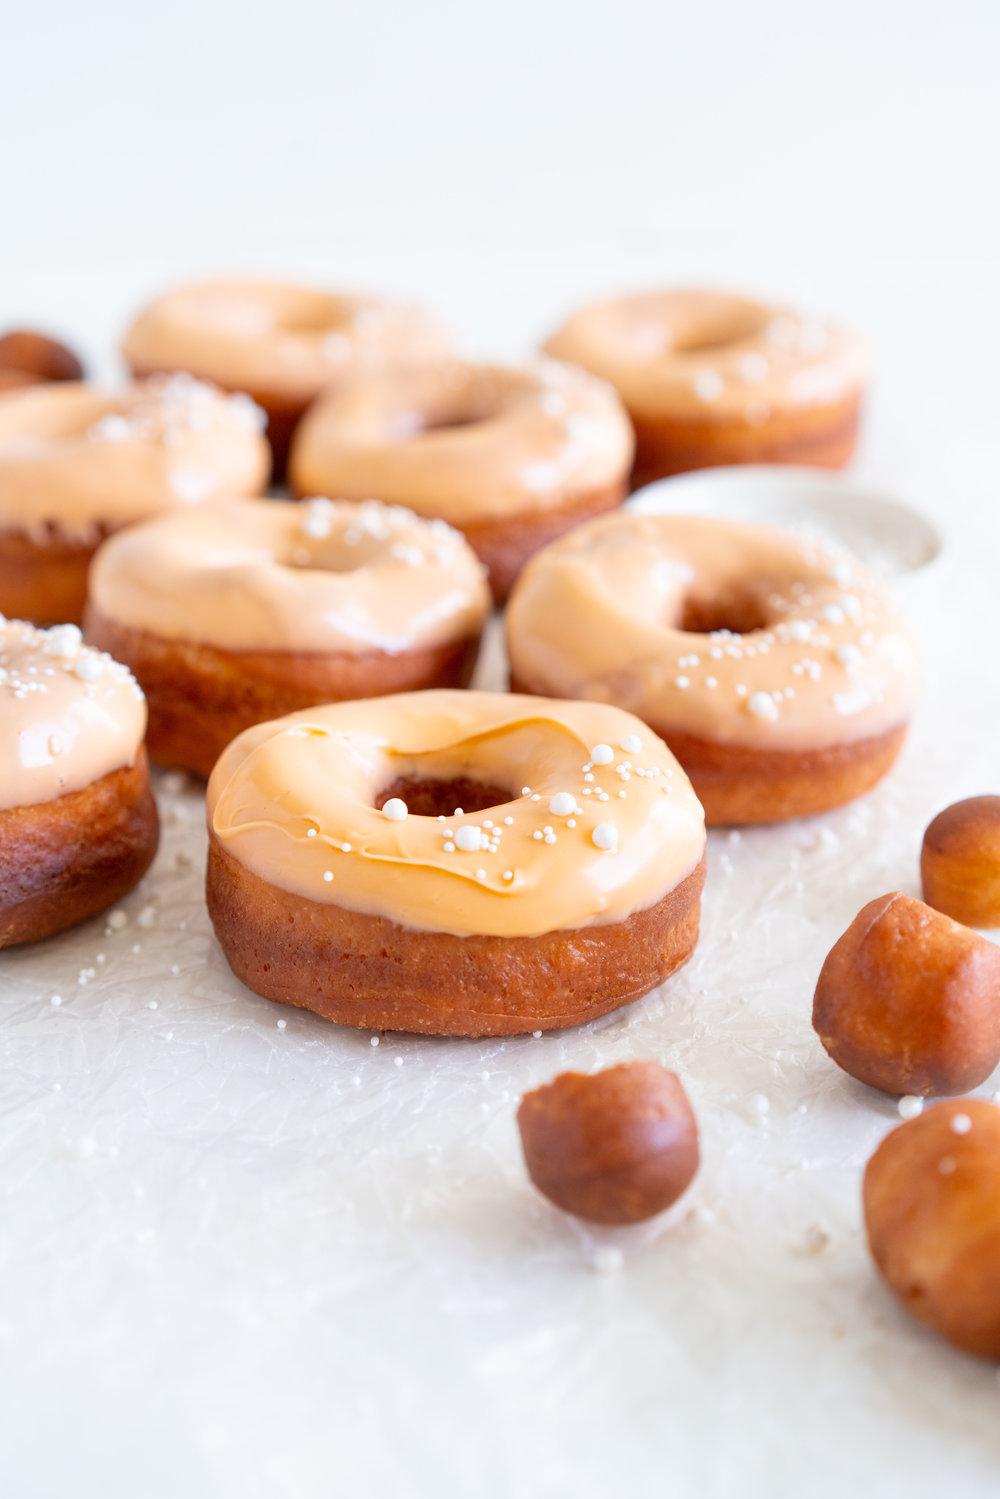 Orange Brioche Doughnuts with Orange CBD glaze. Orange infused yeast raised brioche doughnuts are topped with a sweet glaze, enhanced with CBD oil. #doughnuts #cbd